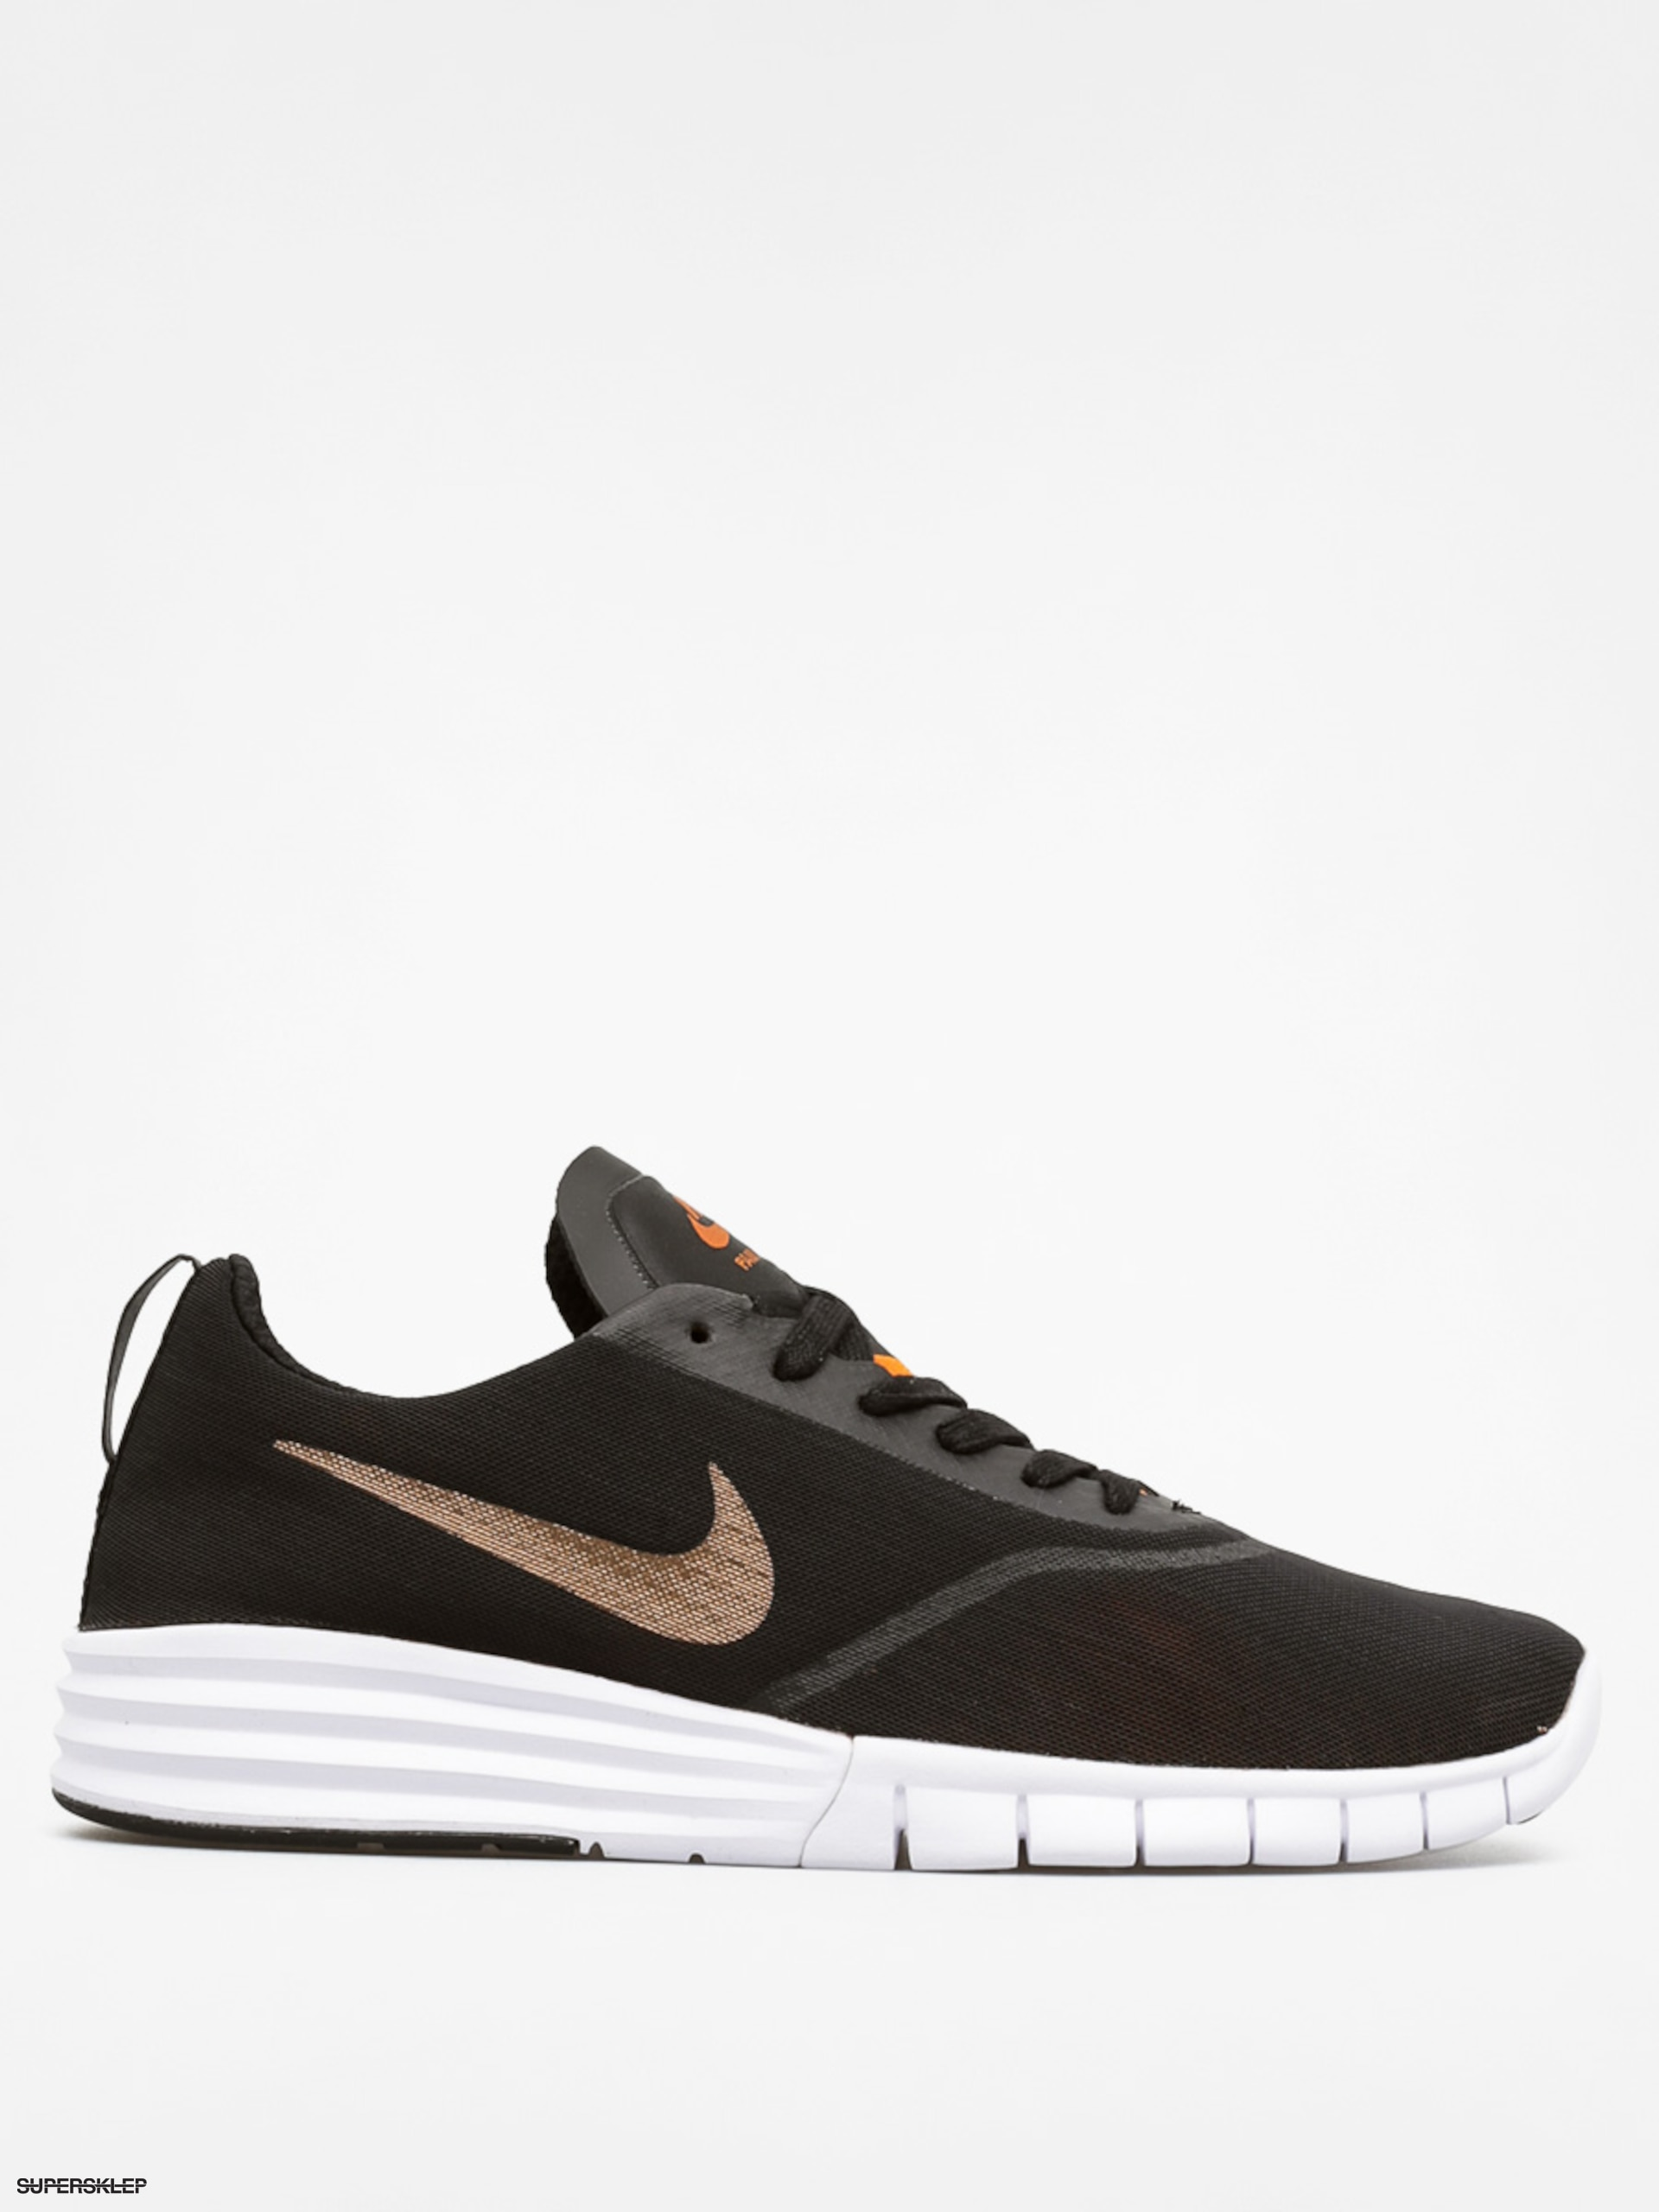 wholesale dealer 6a185 0e554 Buty Nike Sb Lunar Paul Rodriguez 9 (blacksunset white)